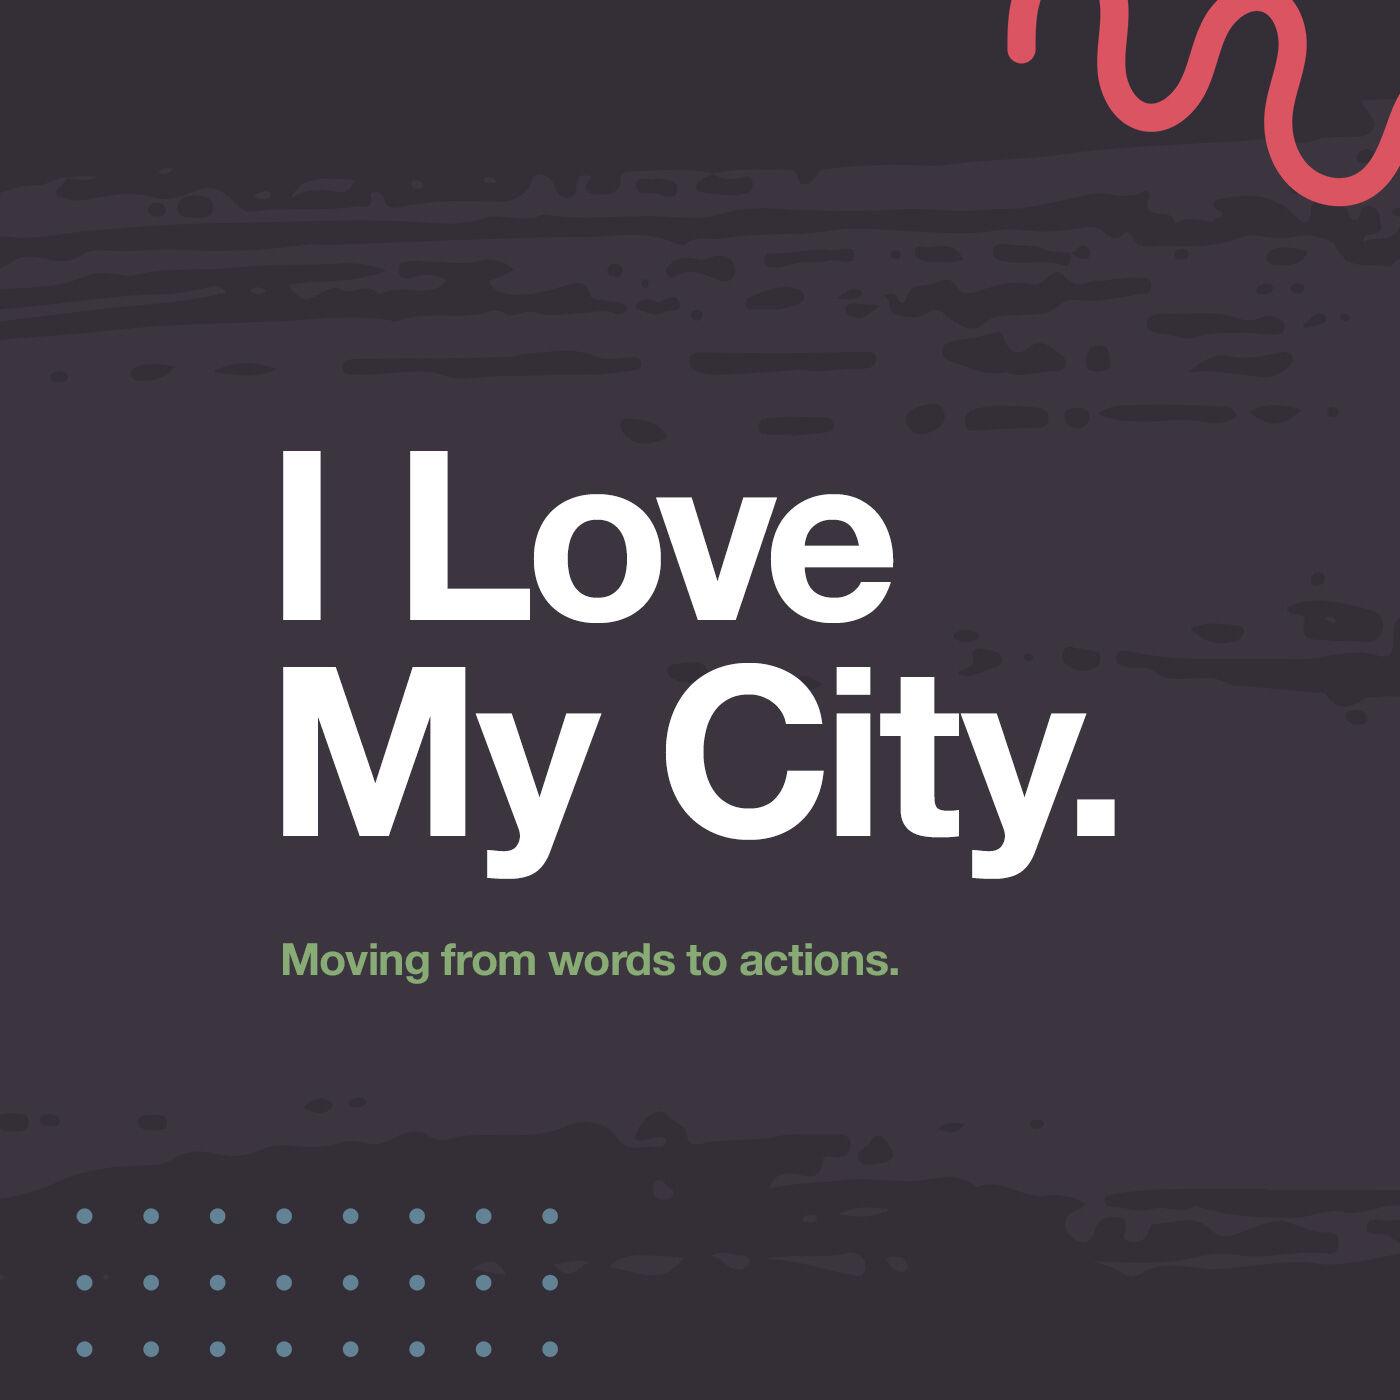 I Love My City 2021, Week 2